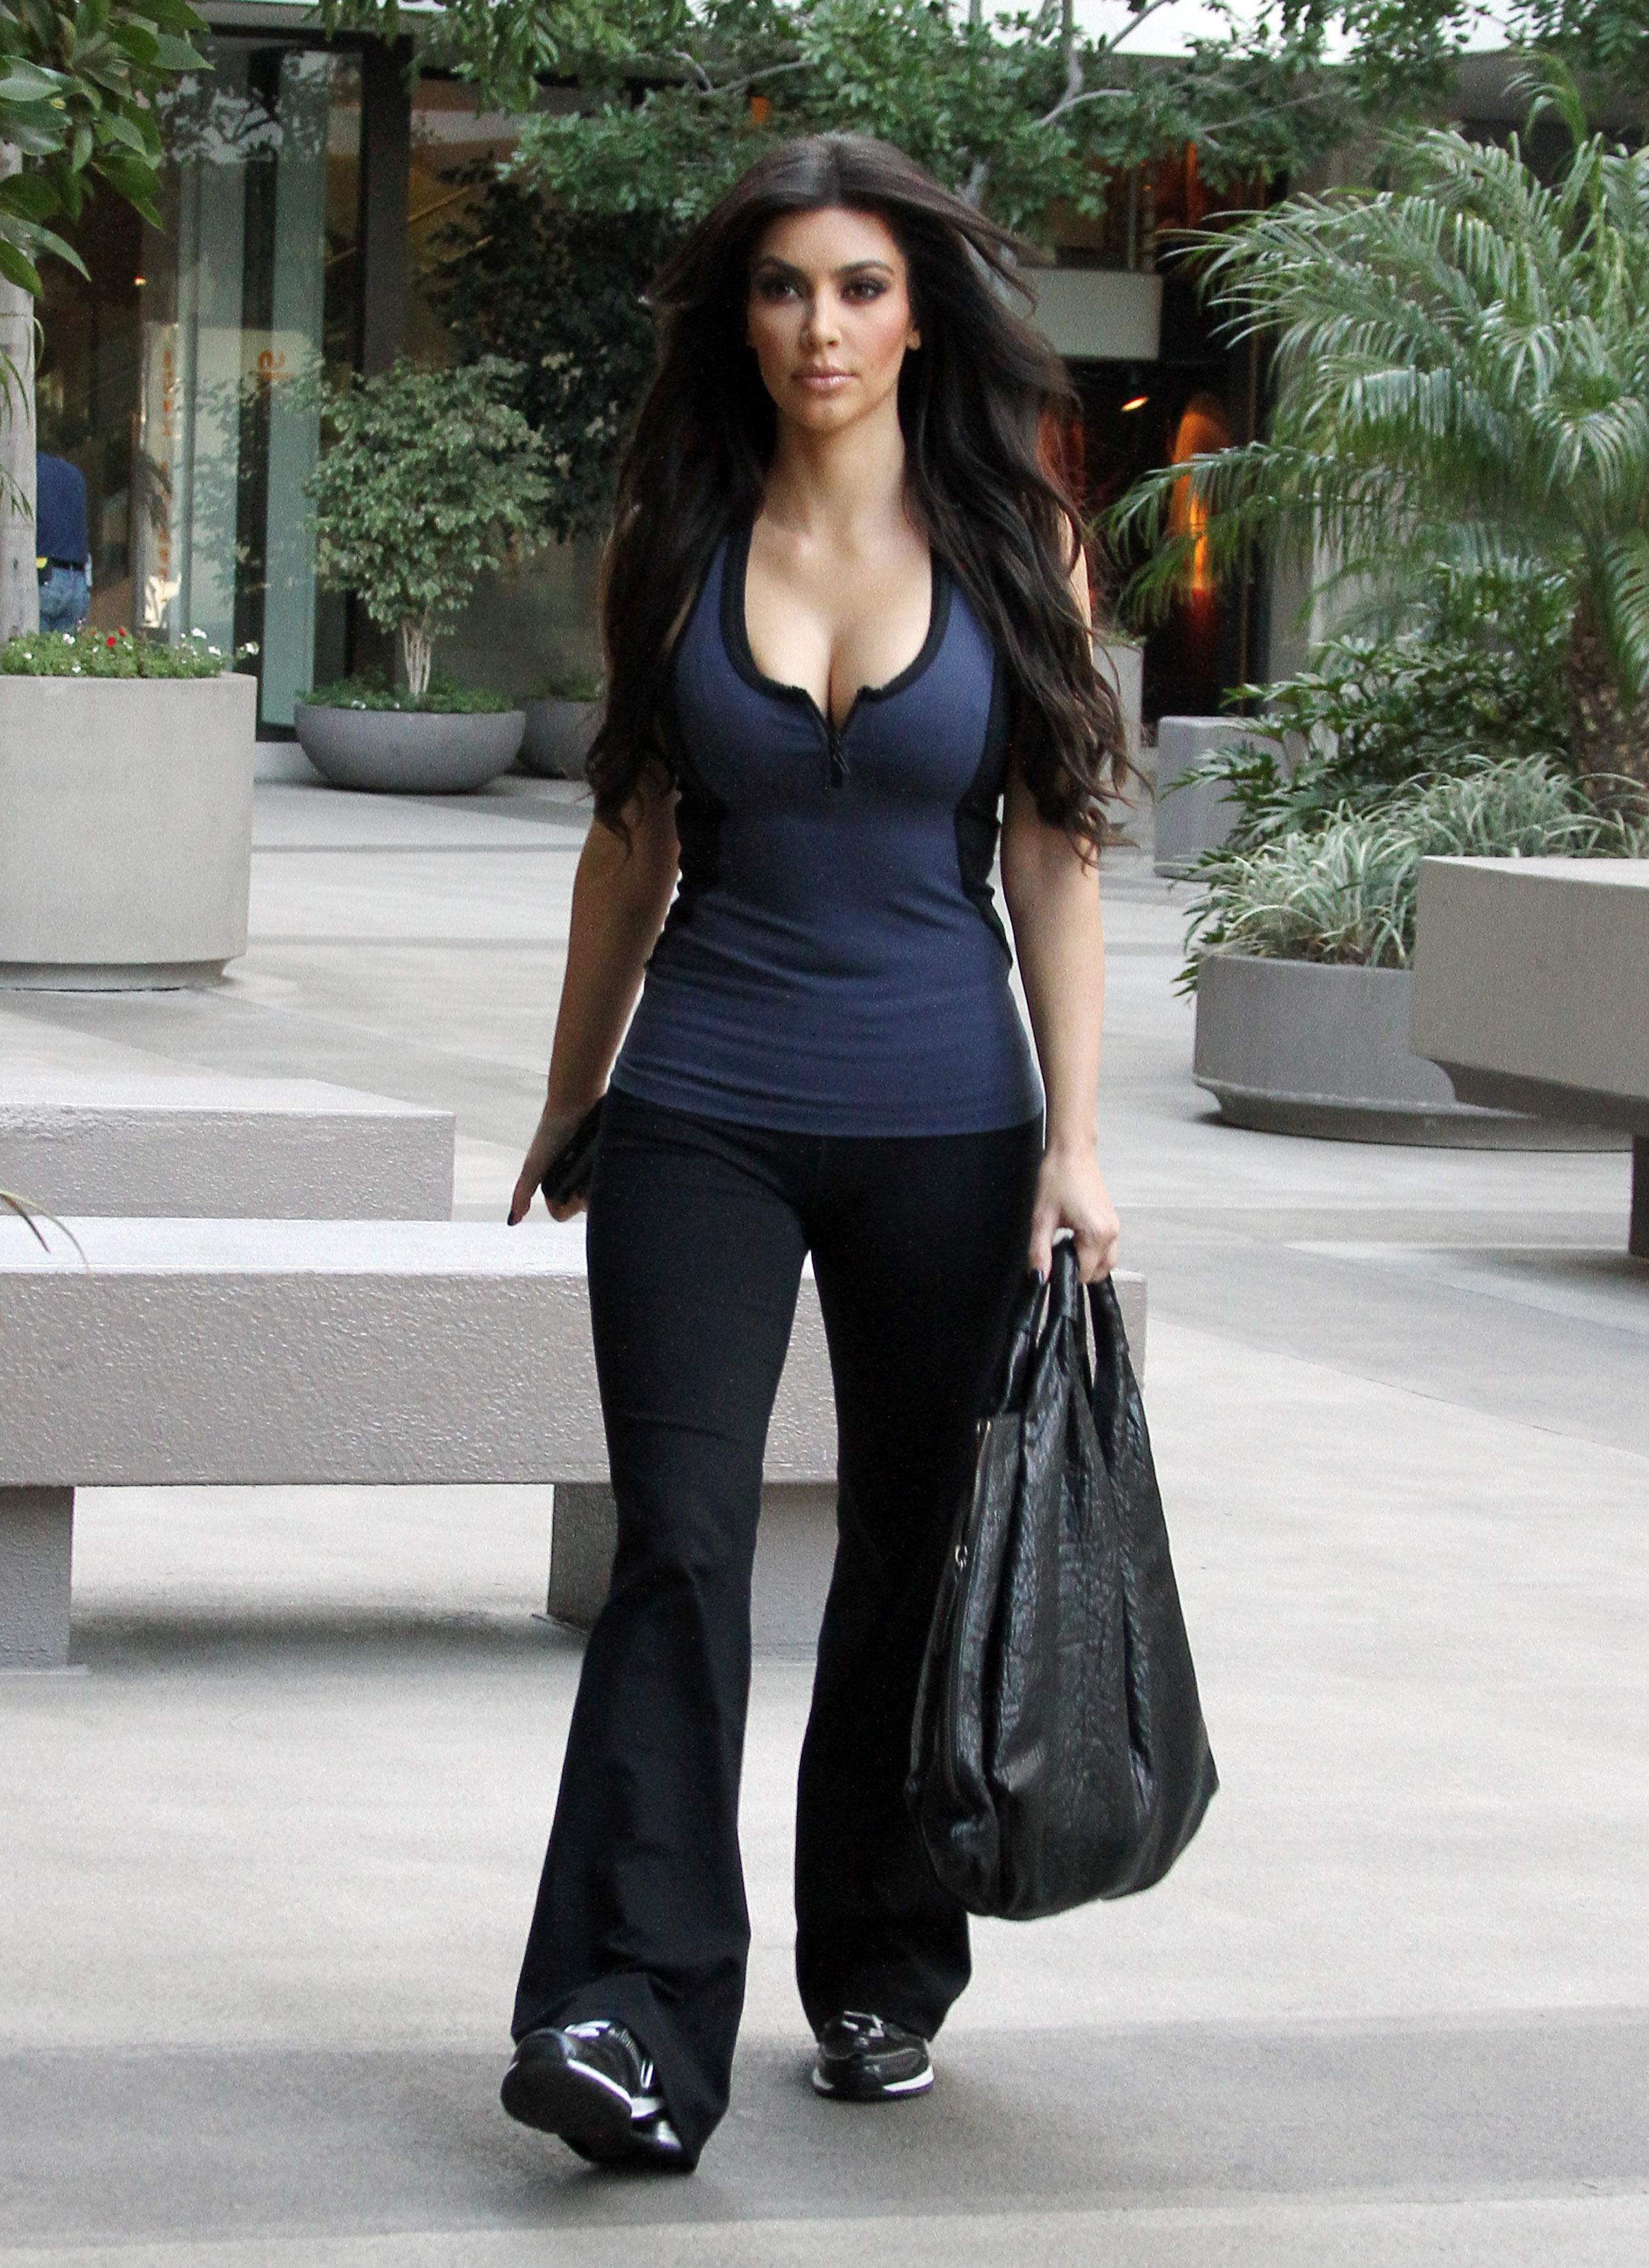 17312__Everly_Kardashian_Ladies_1_122_528lo.jpg